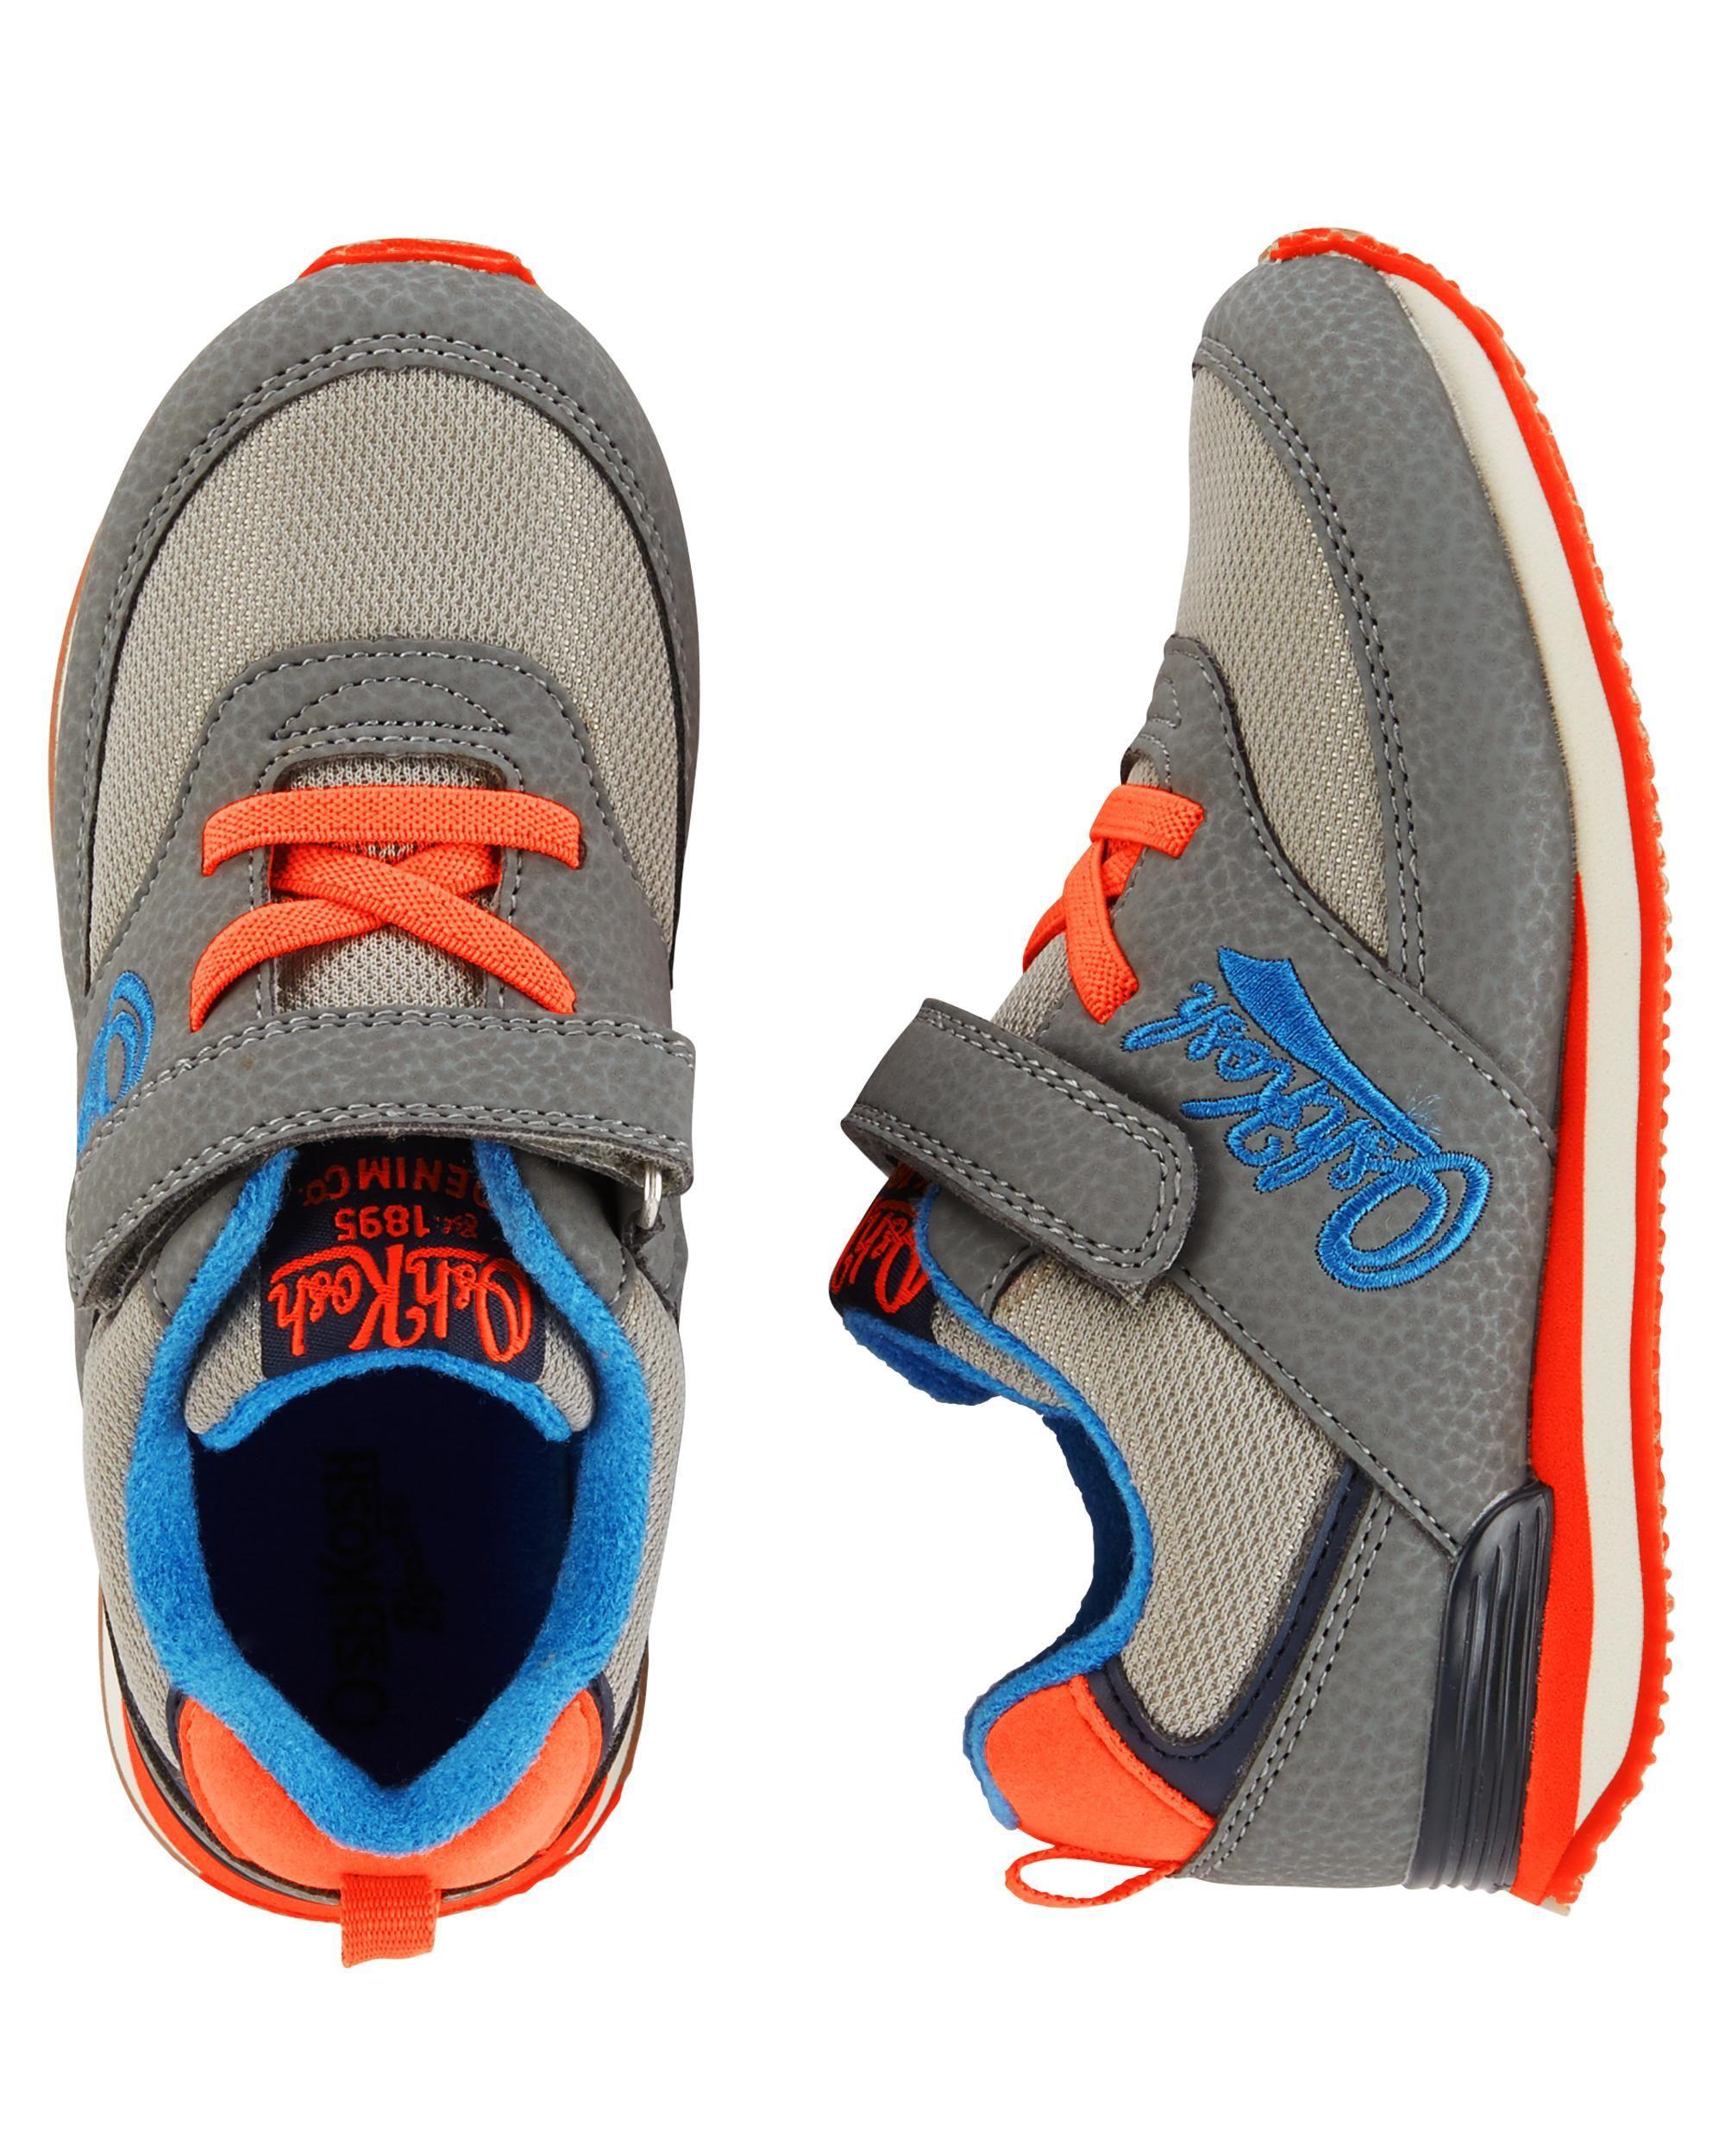 OshKosh Athletic Sneakers | Baby